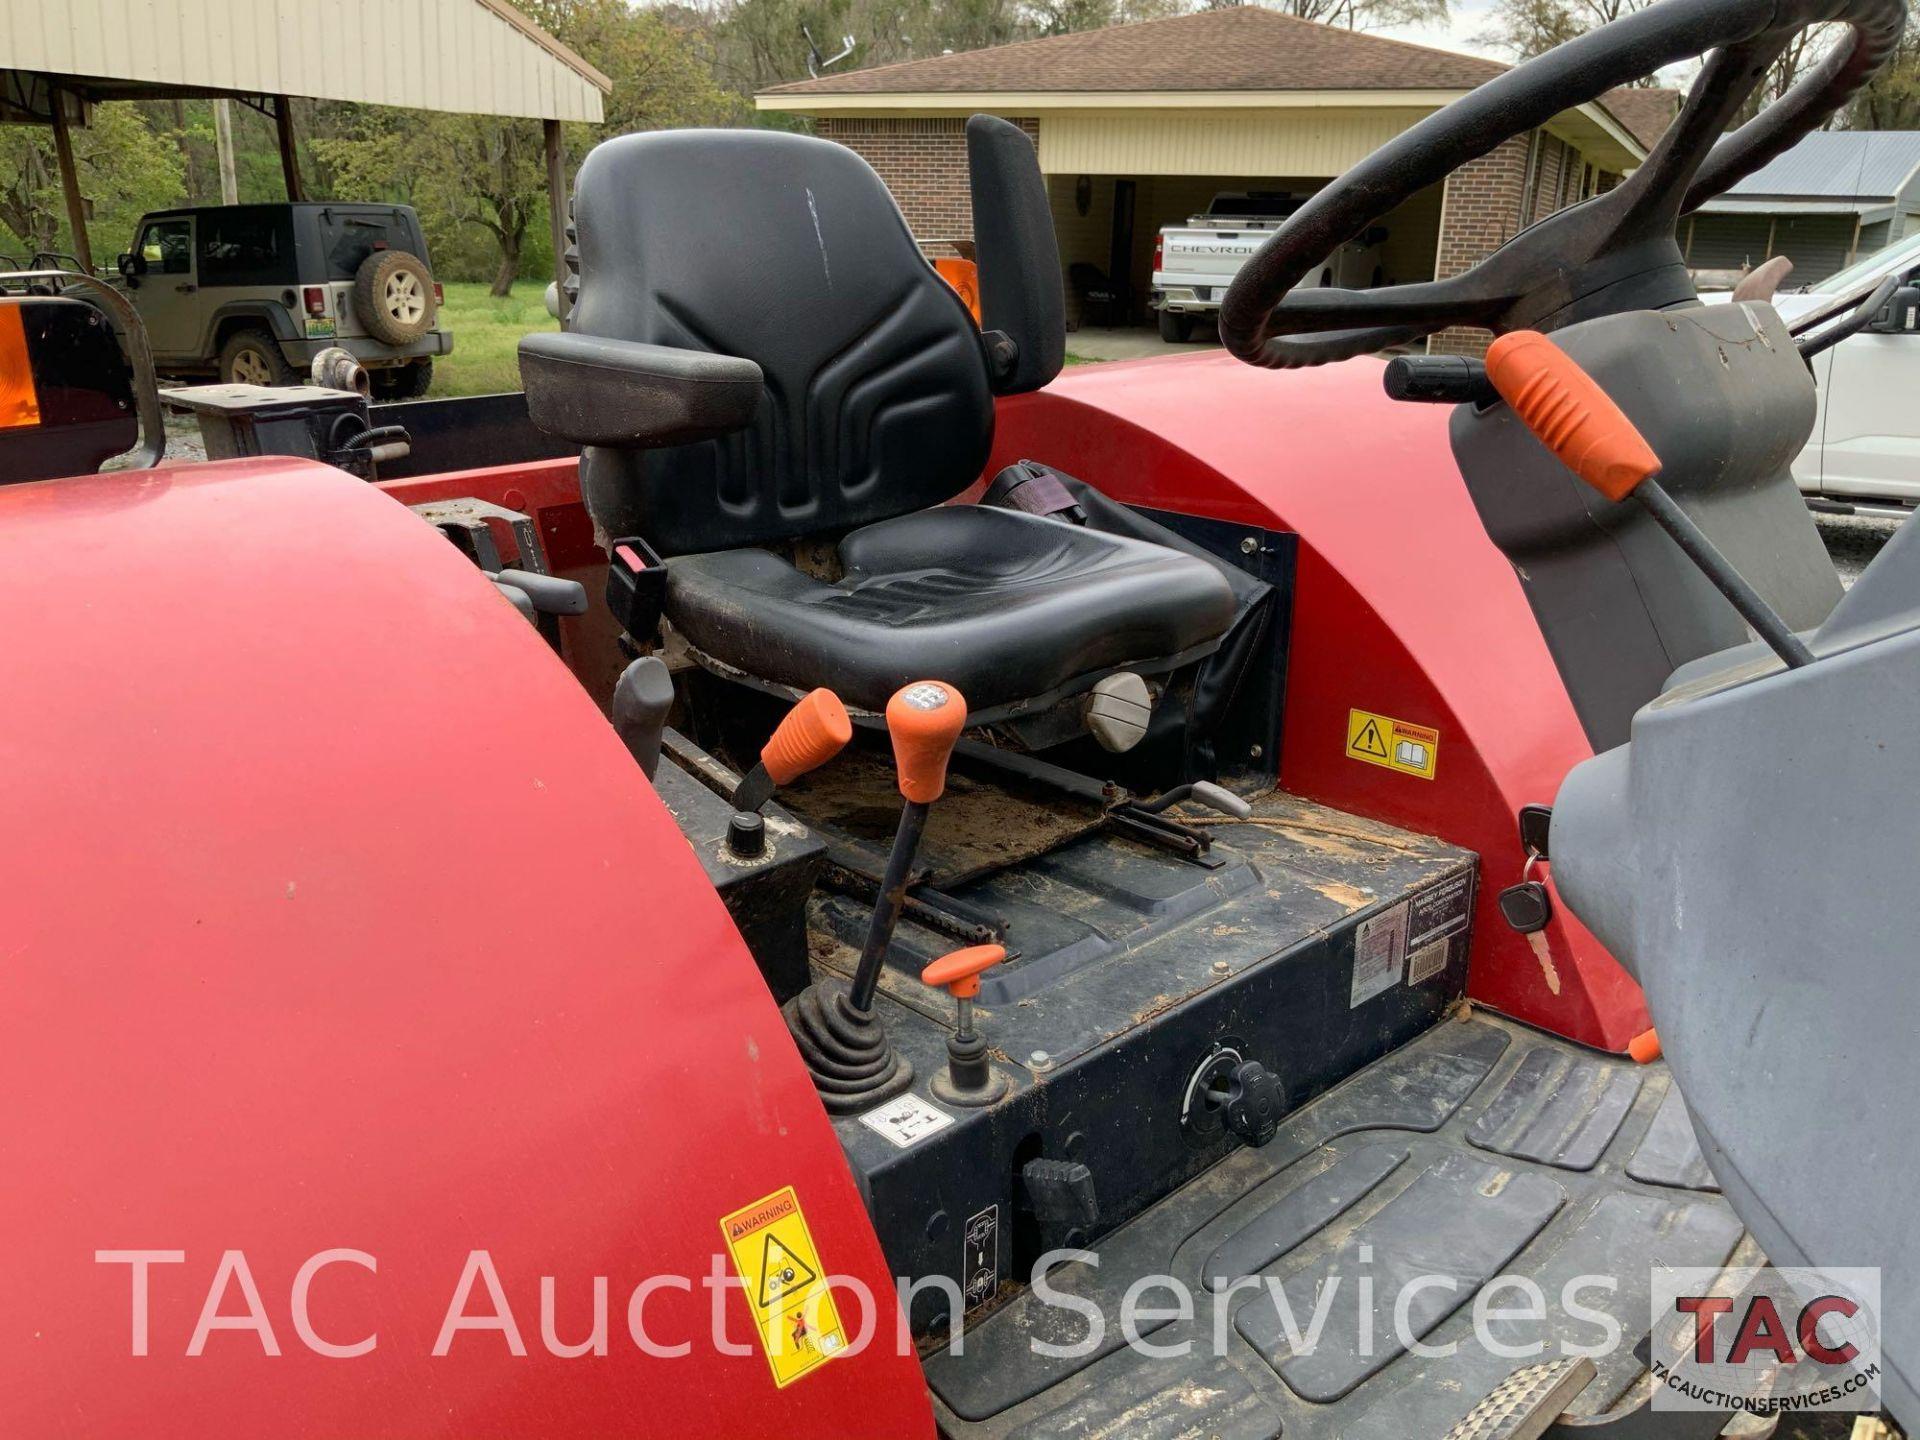 Massey-Ferguson 4610LP Farm Tractor - Image 13 of 26